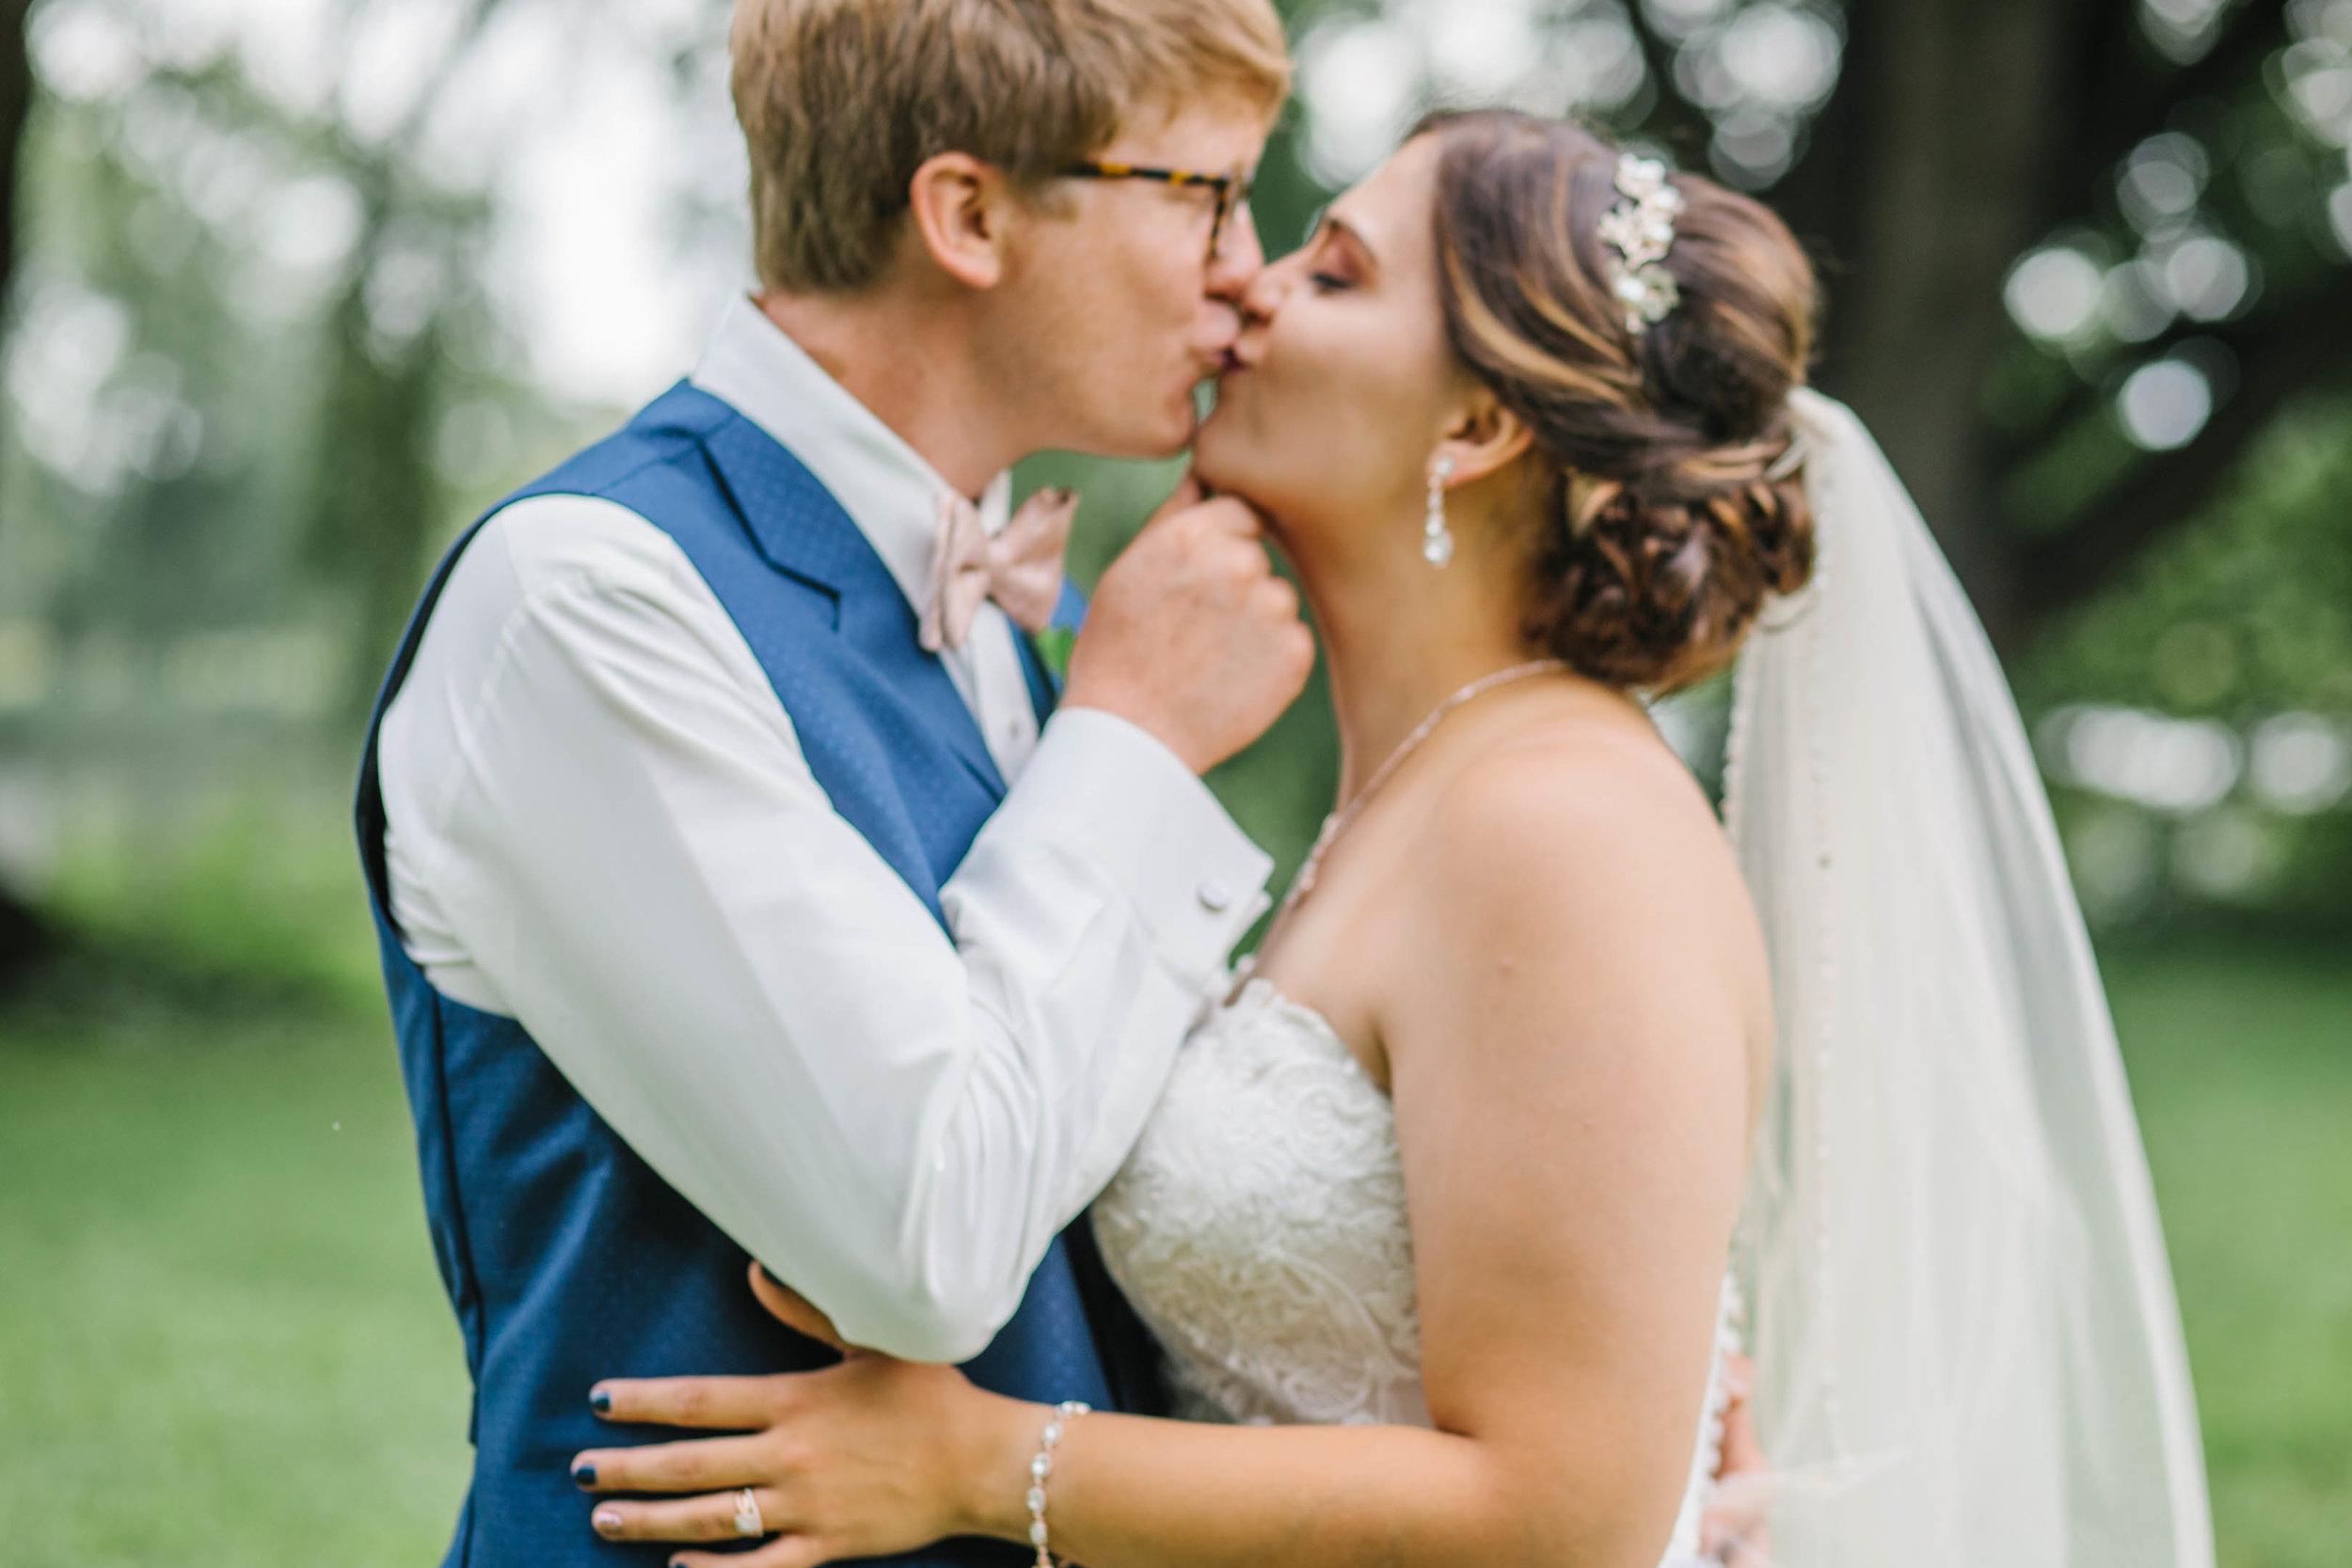 romantic wedding photos amelia renee photography